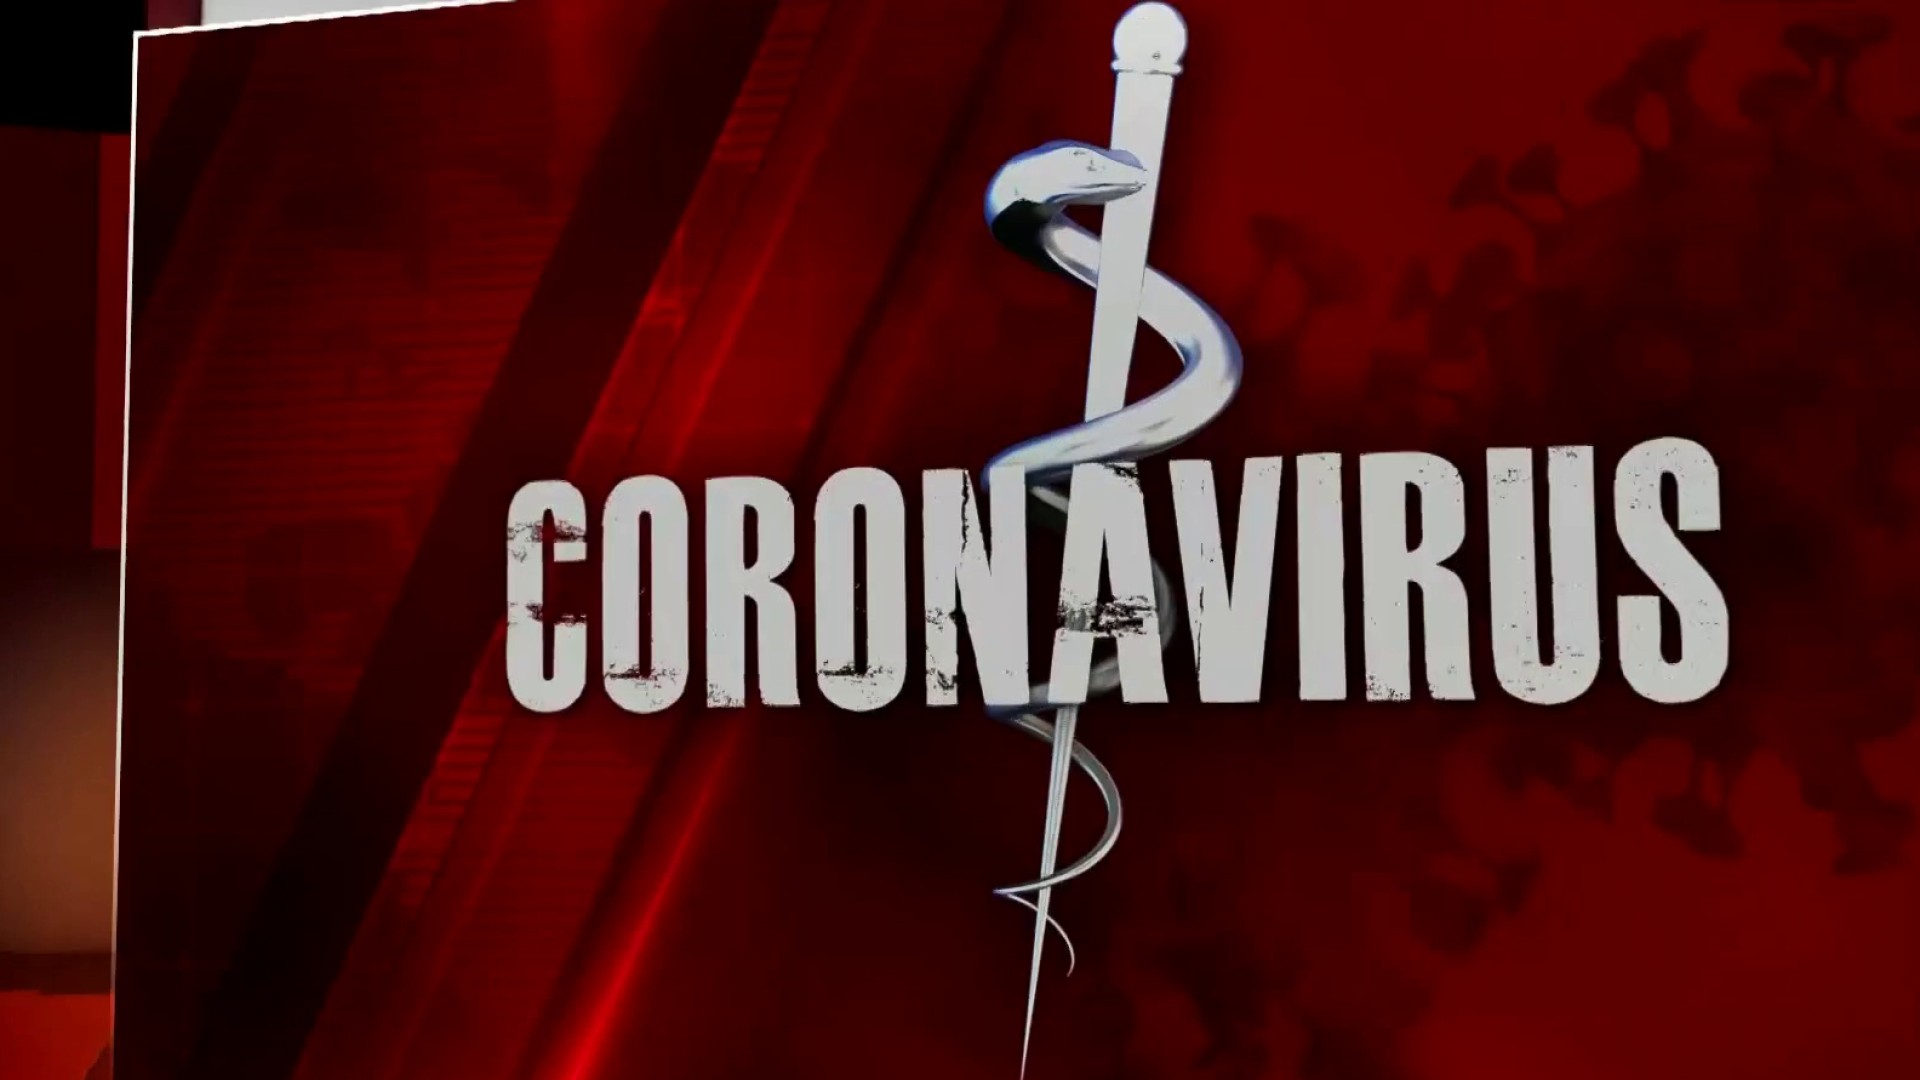 Department of Health reports 2 Coronavirus deaths in Florida